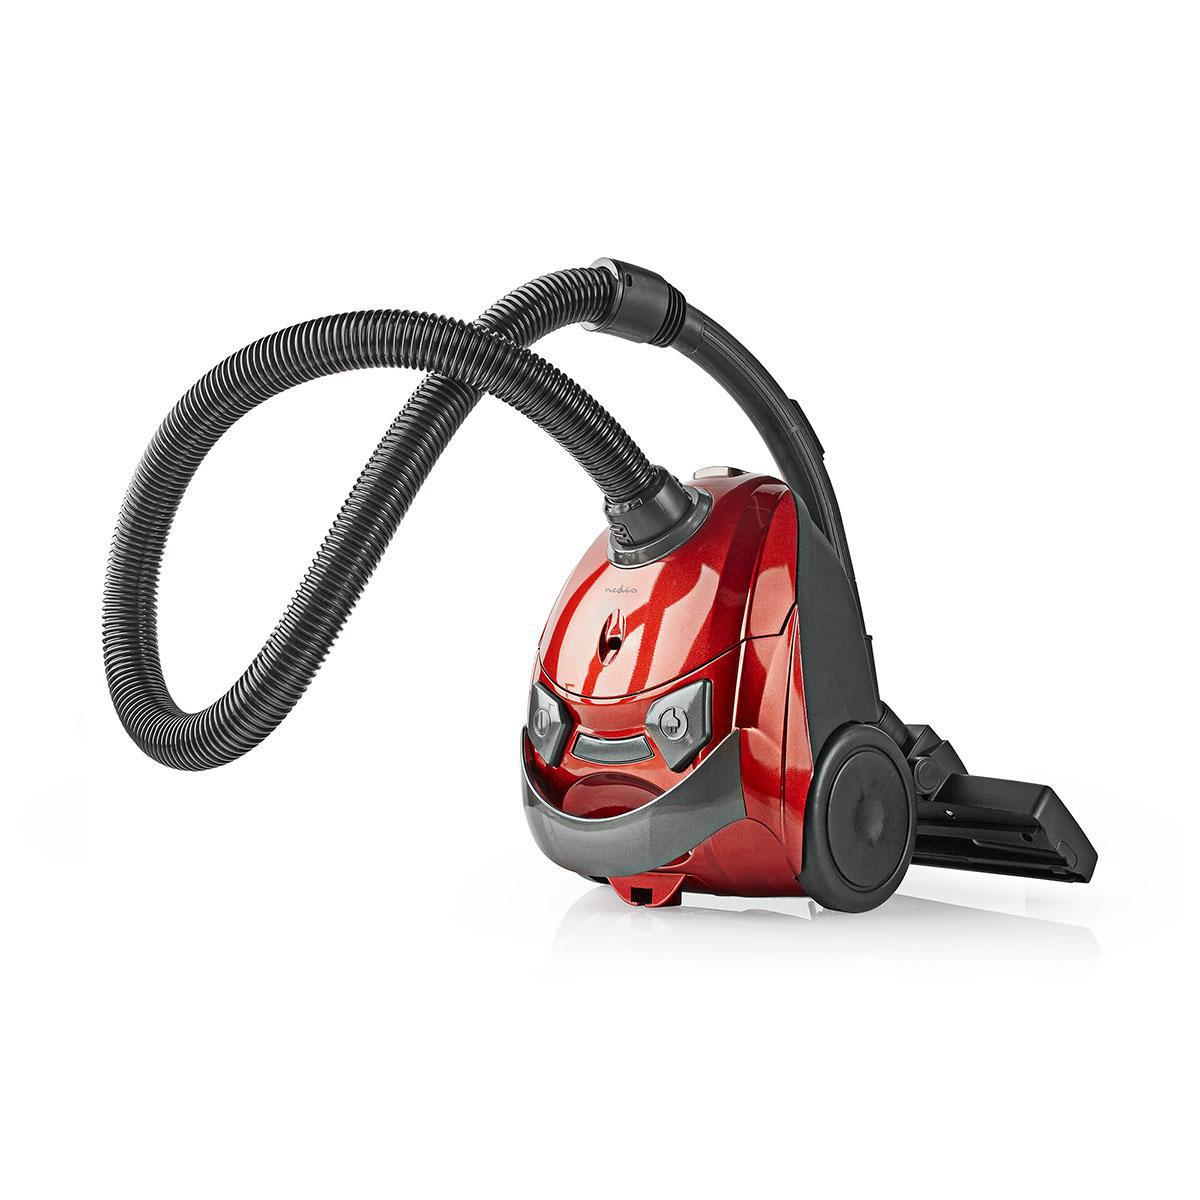 Støvsuger   Med Pose   700 W   1.5 L Støvkapasitet   Rød   Nedis